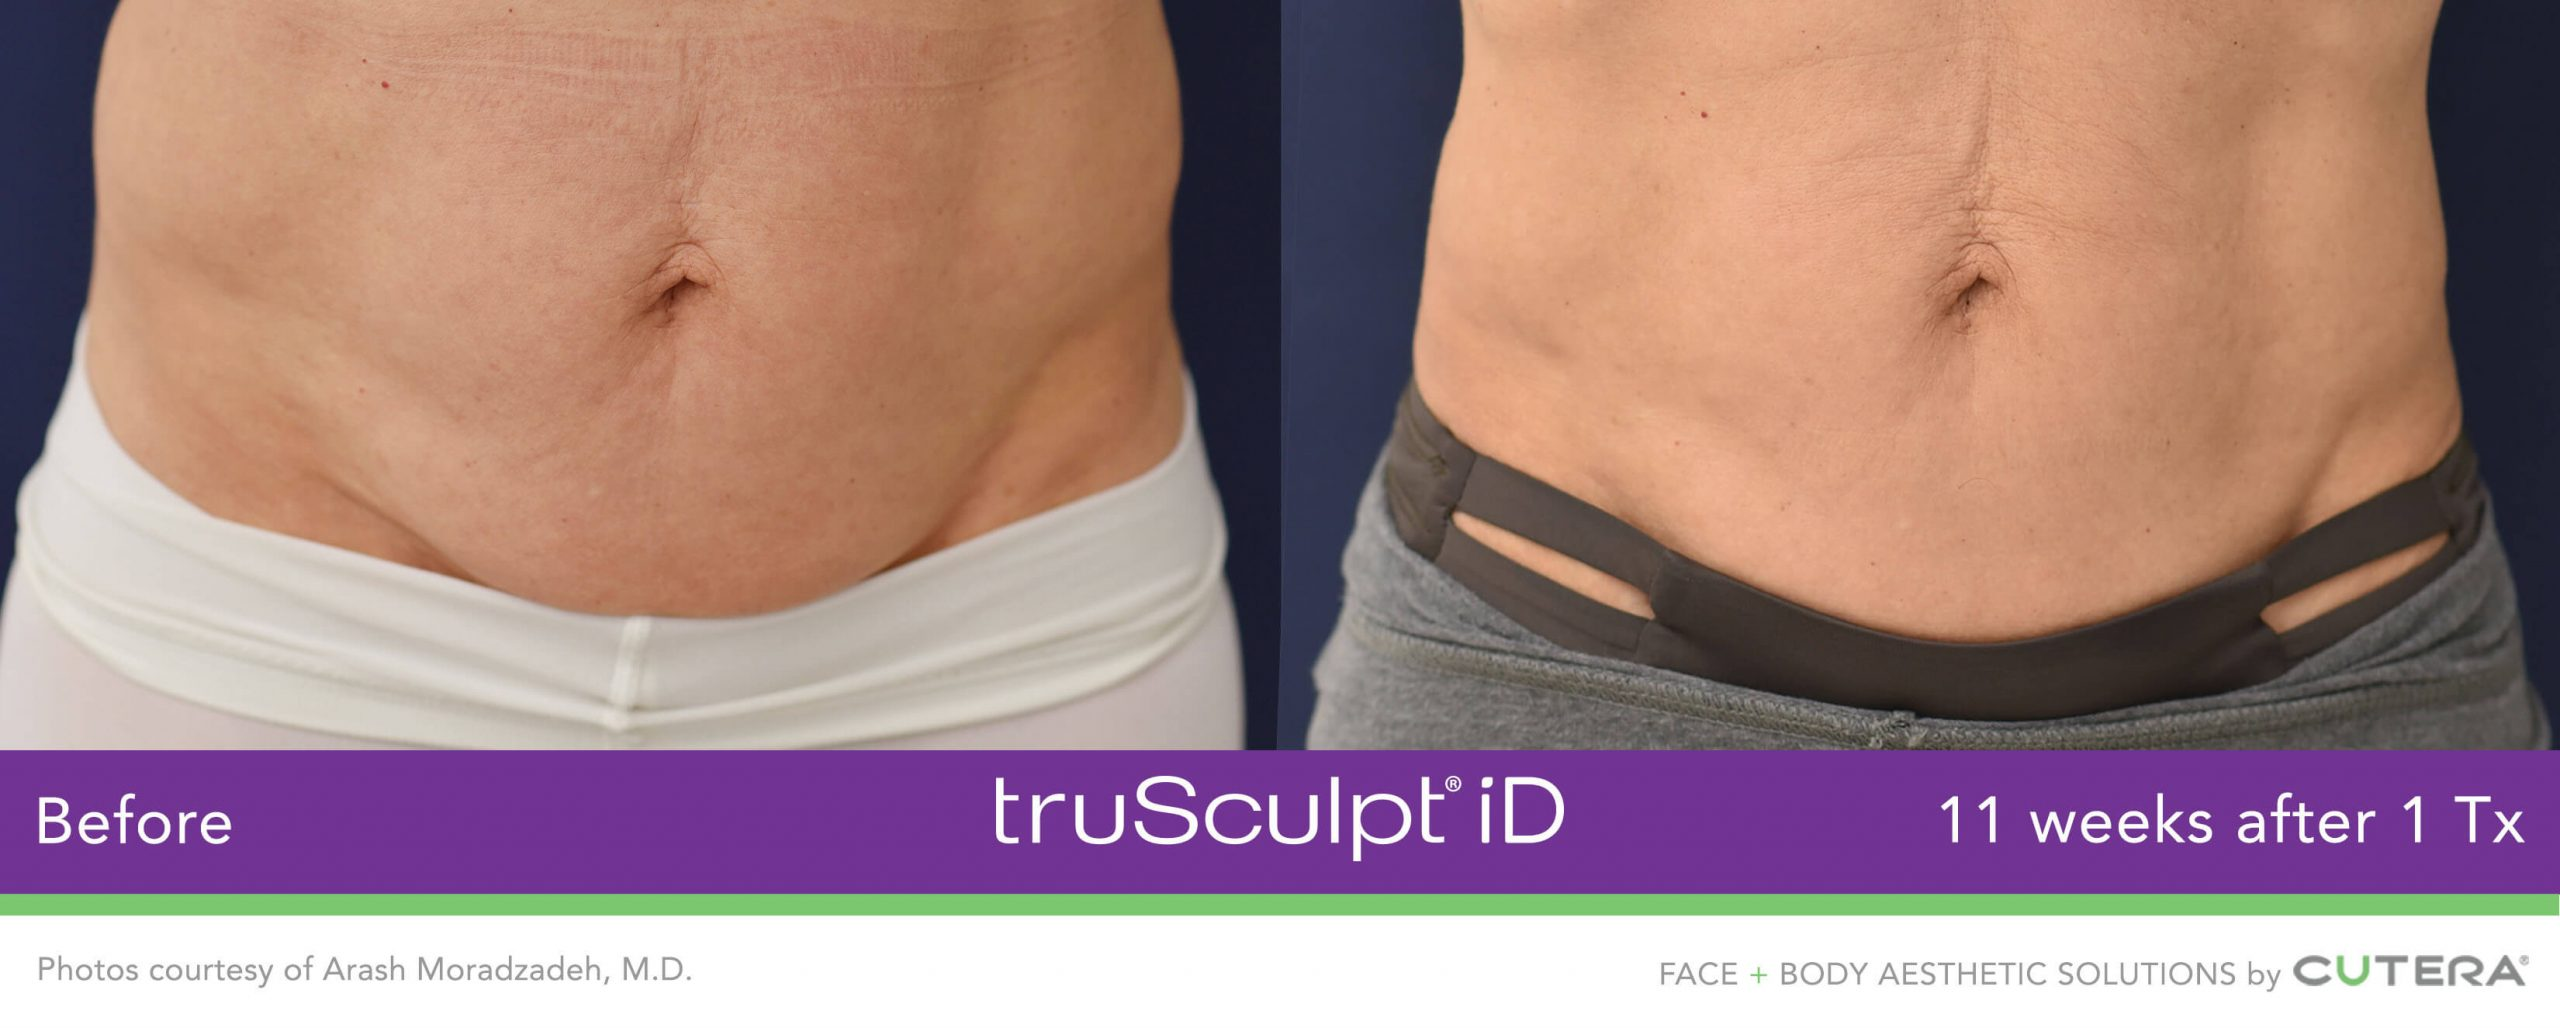 truSculpt-iD